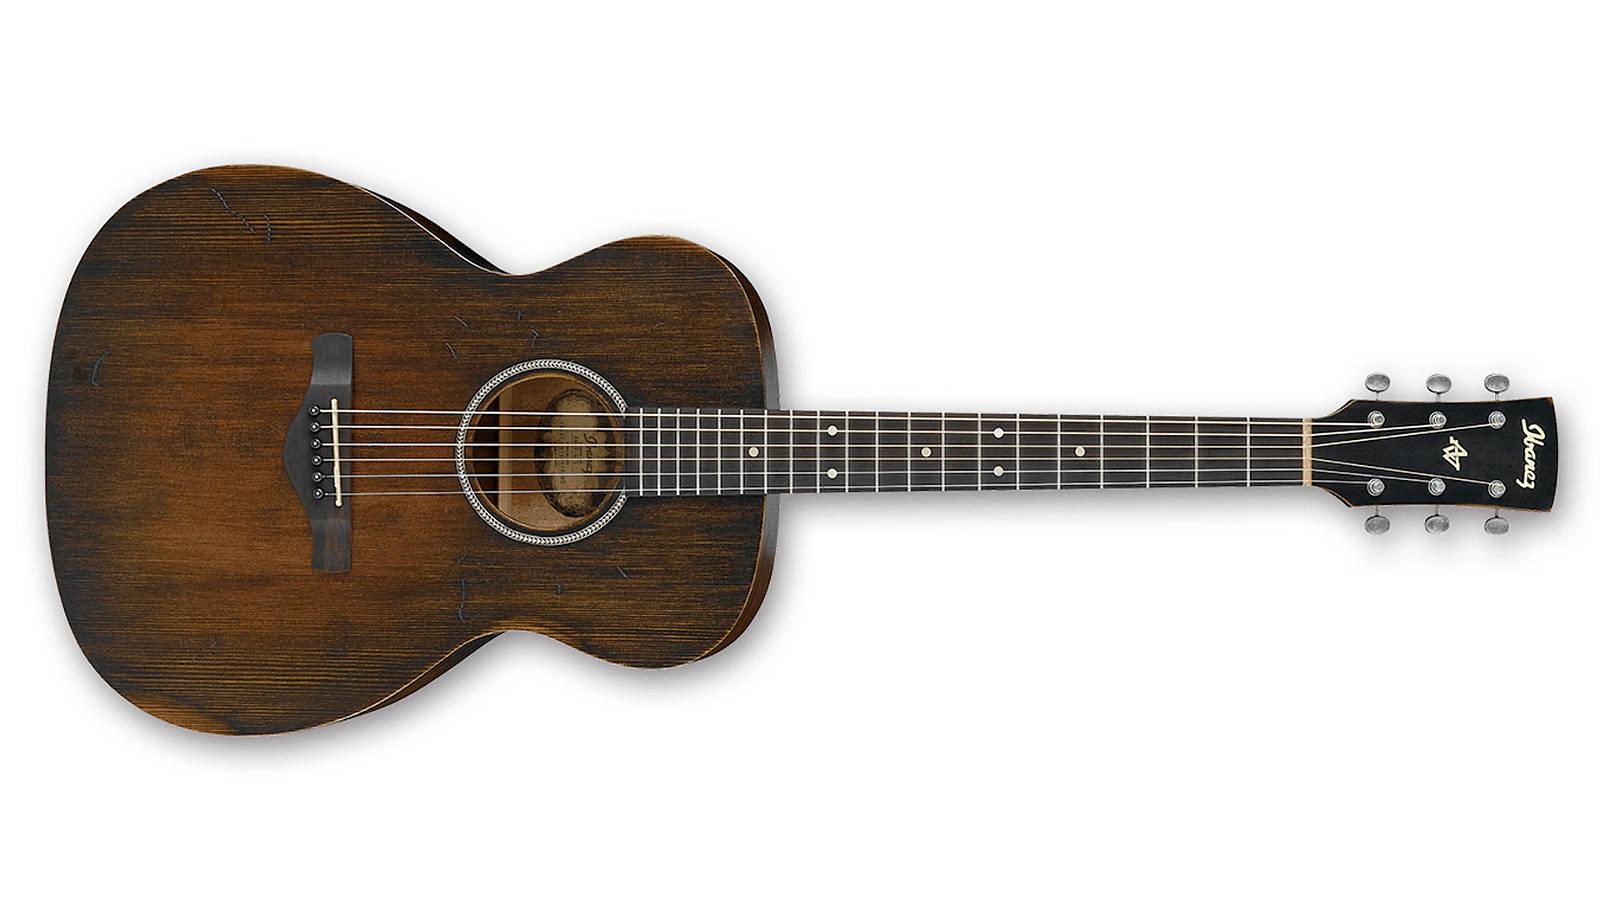 Ibanez AVC6-DTS Artwood Vintage Westerngitarre